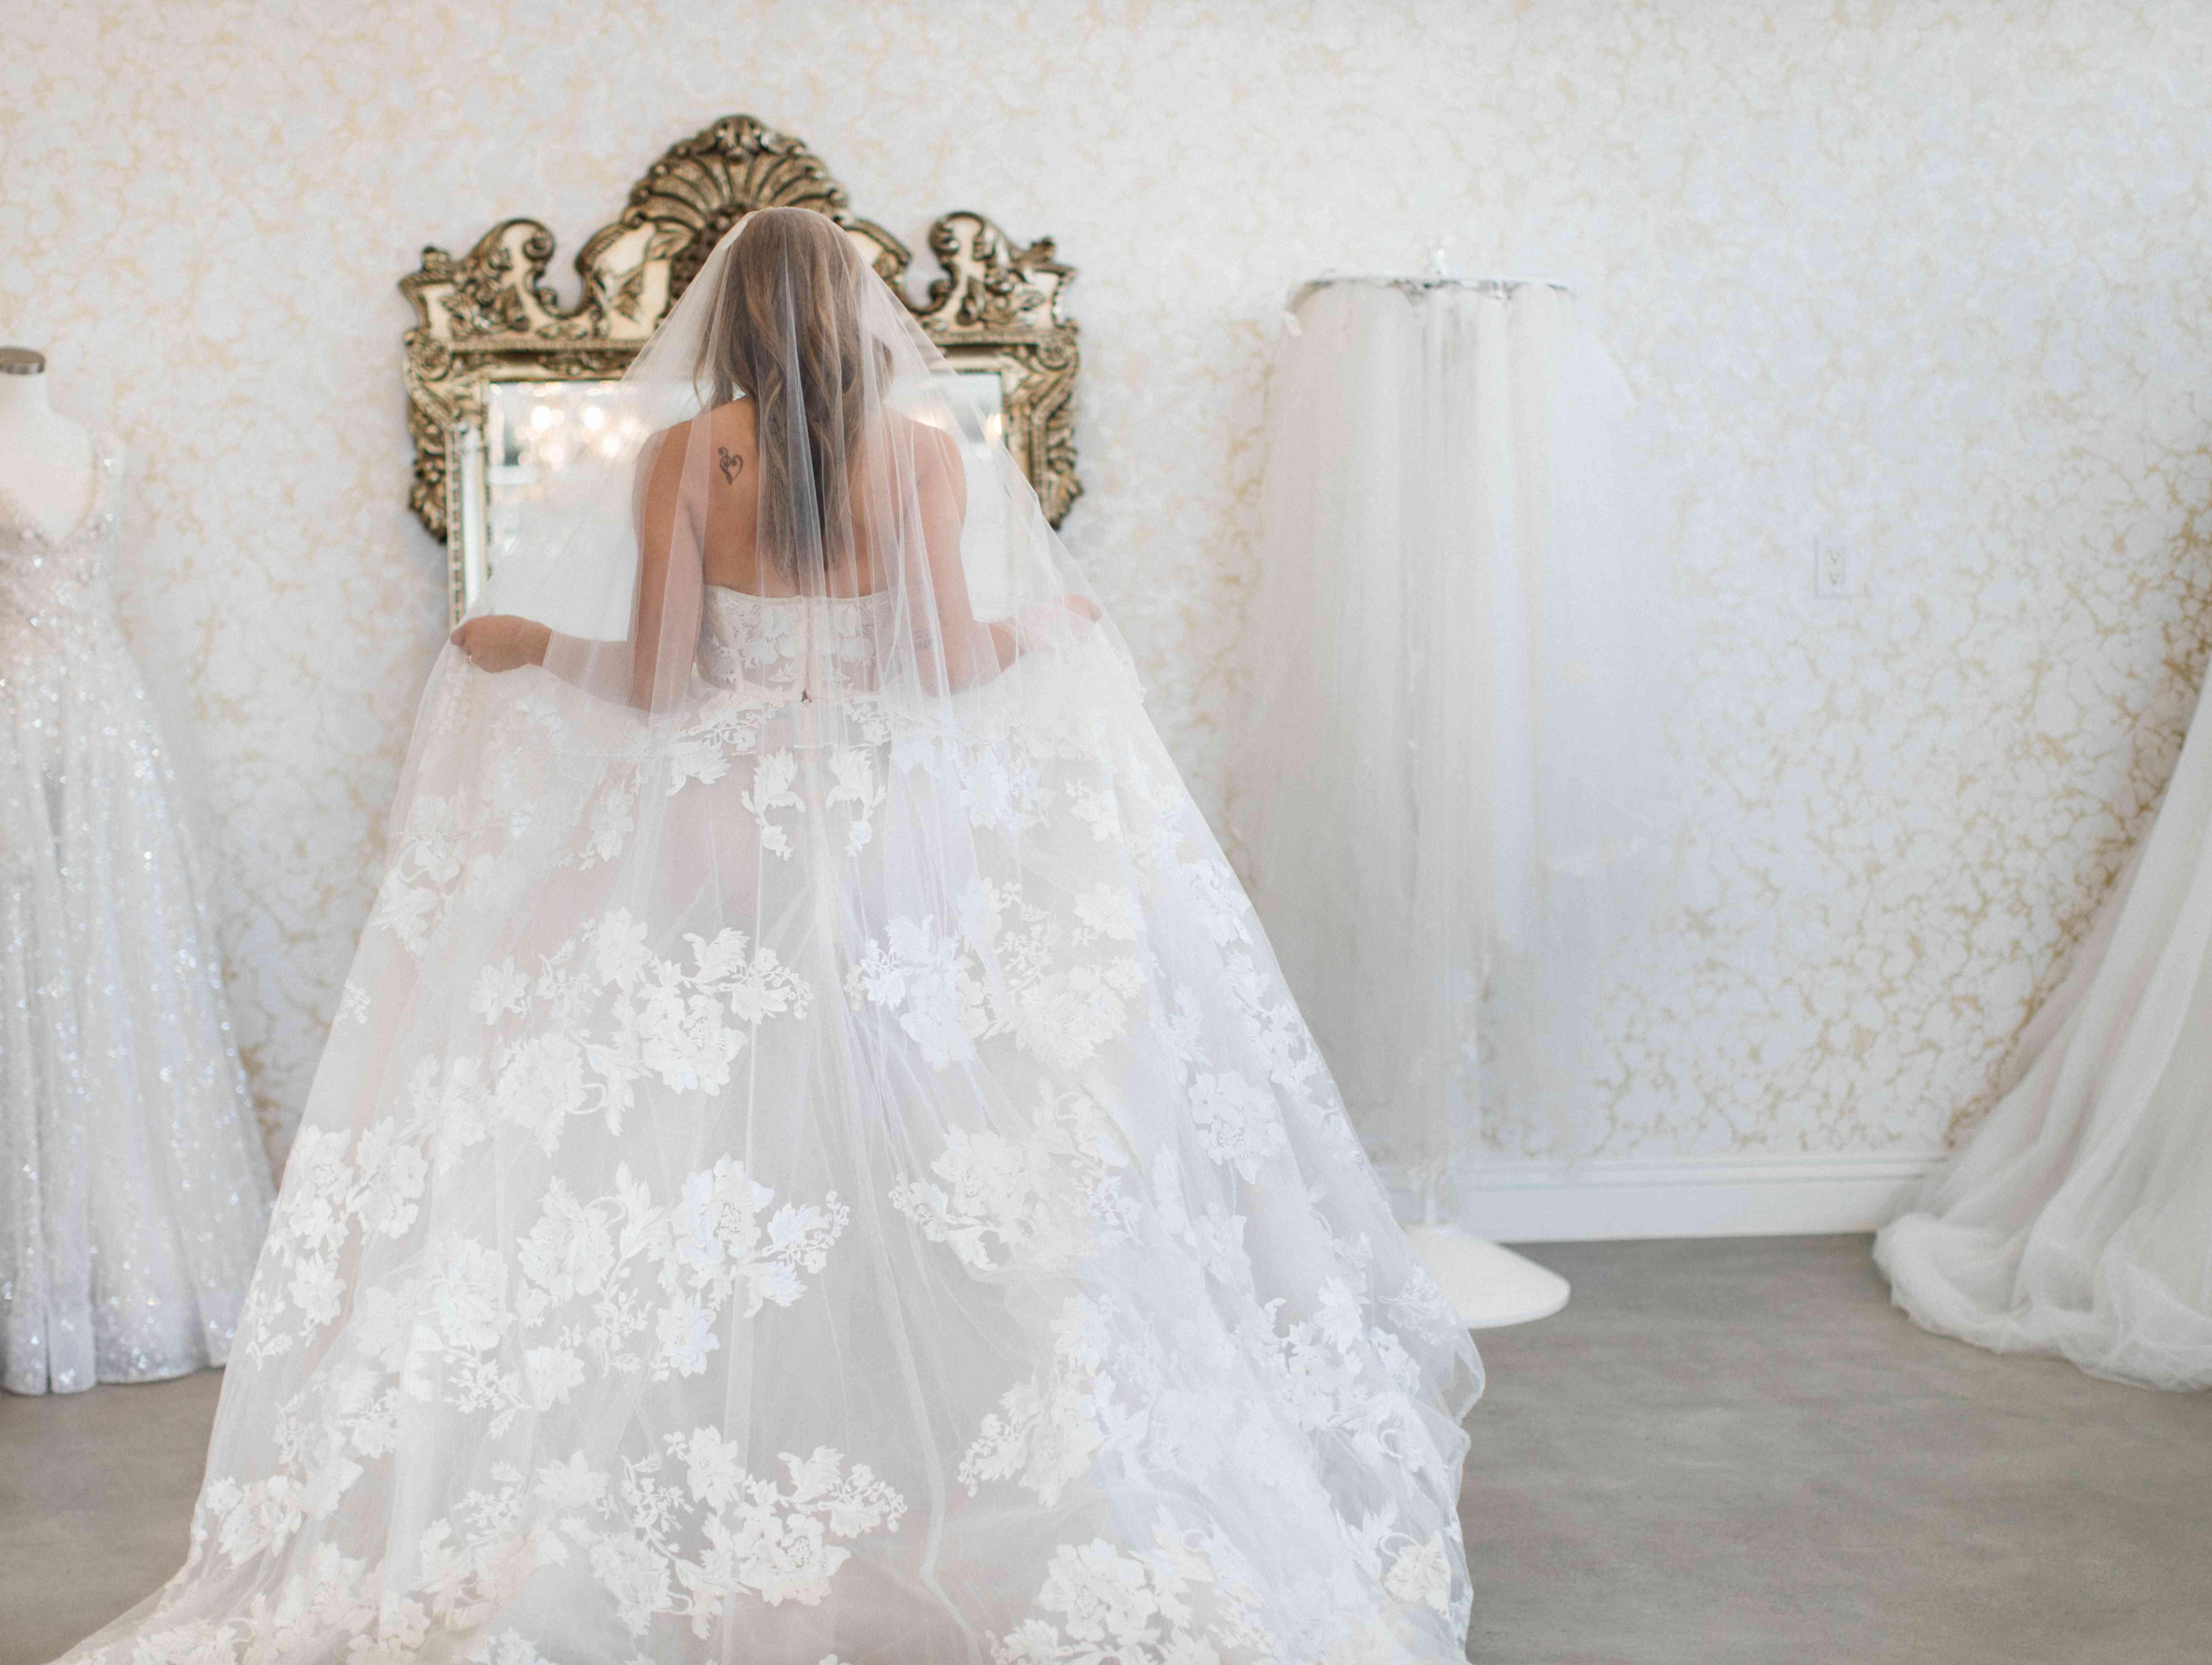 jenna ushkowtiz dress shopping